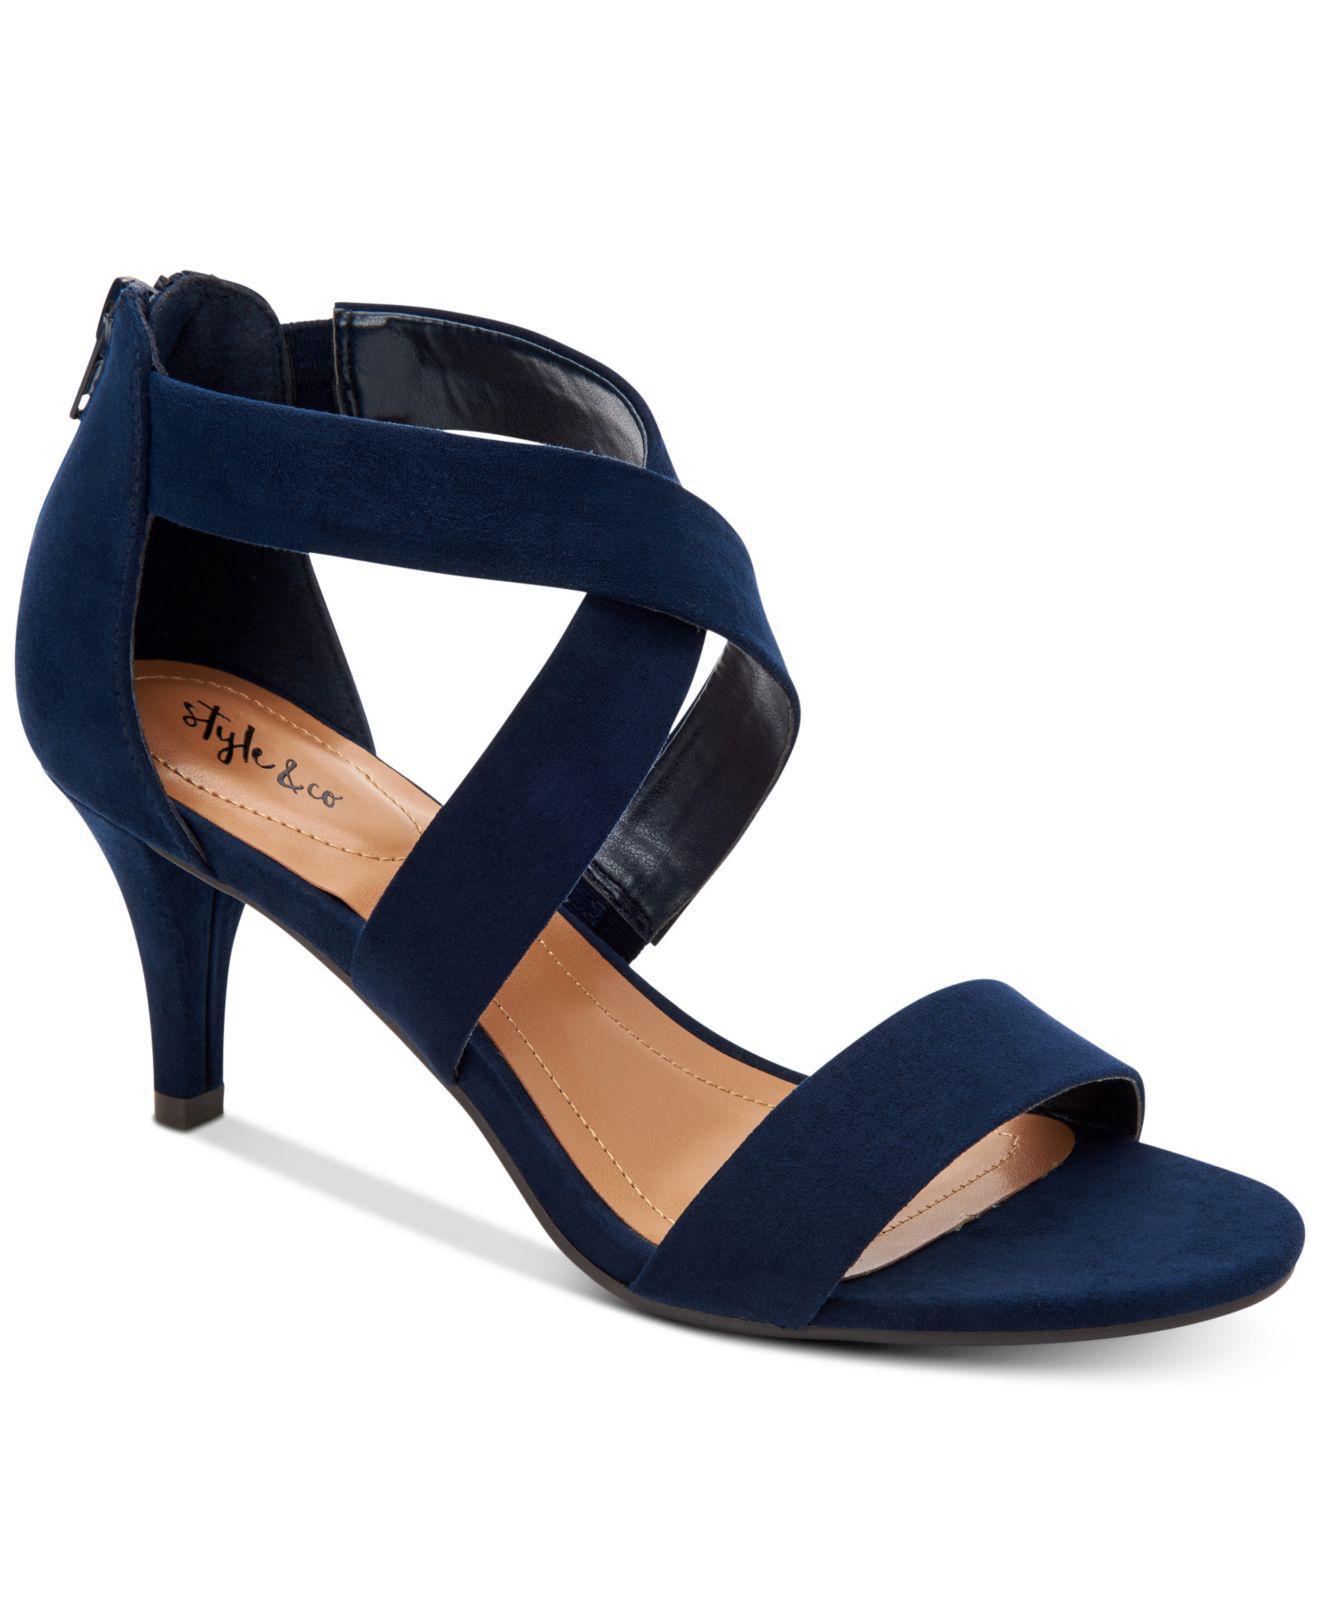 f46fe458b Lyst - Style   Co. Paysonn Dress Sandals